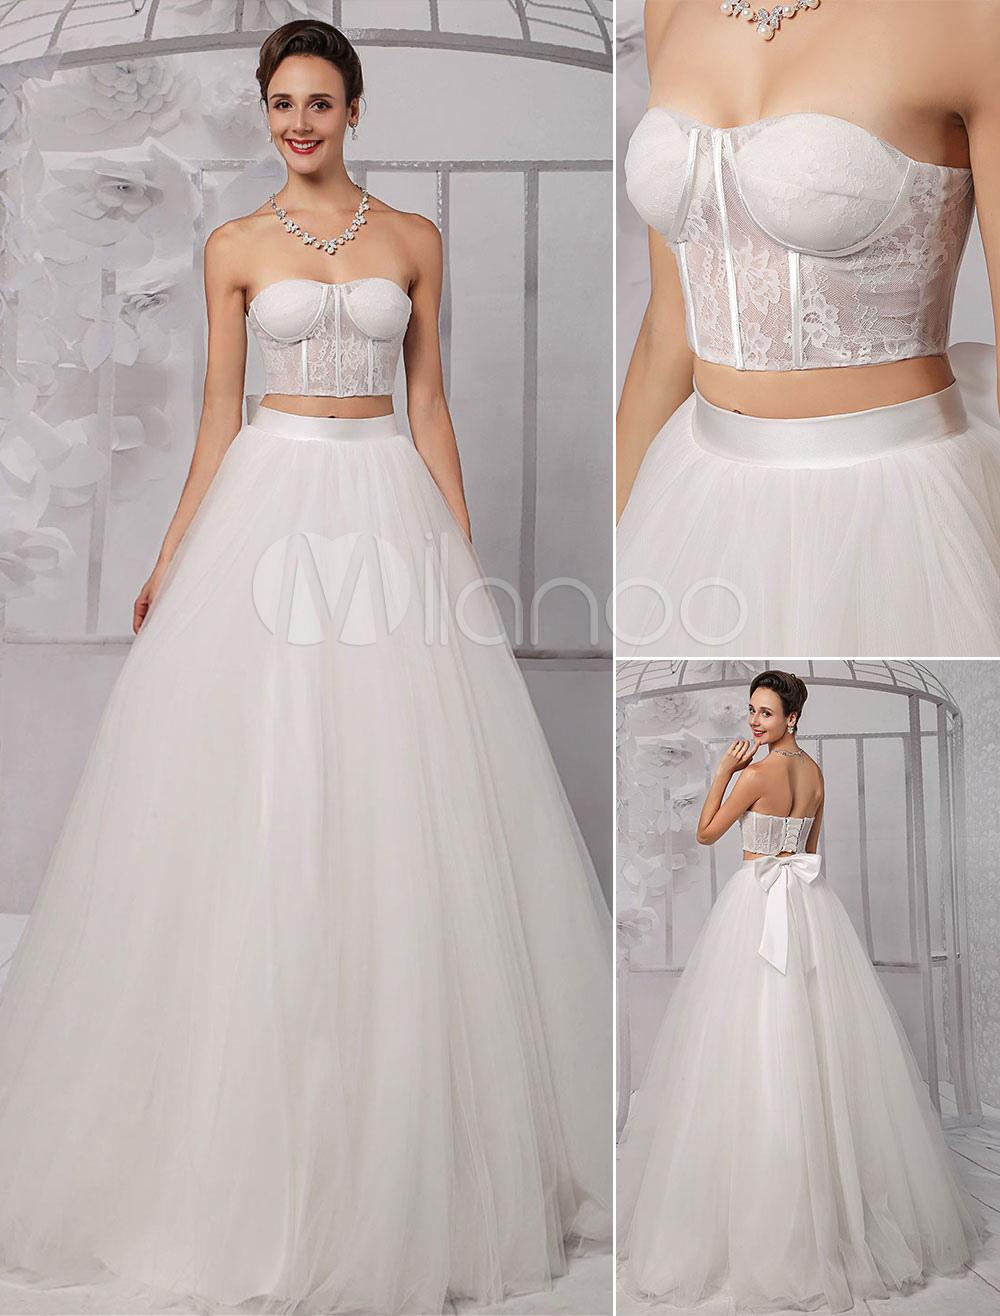 Wedding Dress Lace Corset Top - Wedding Guest Dresses